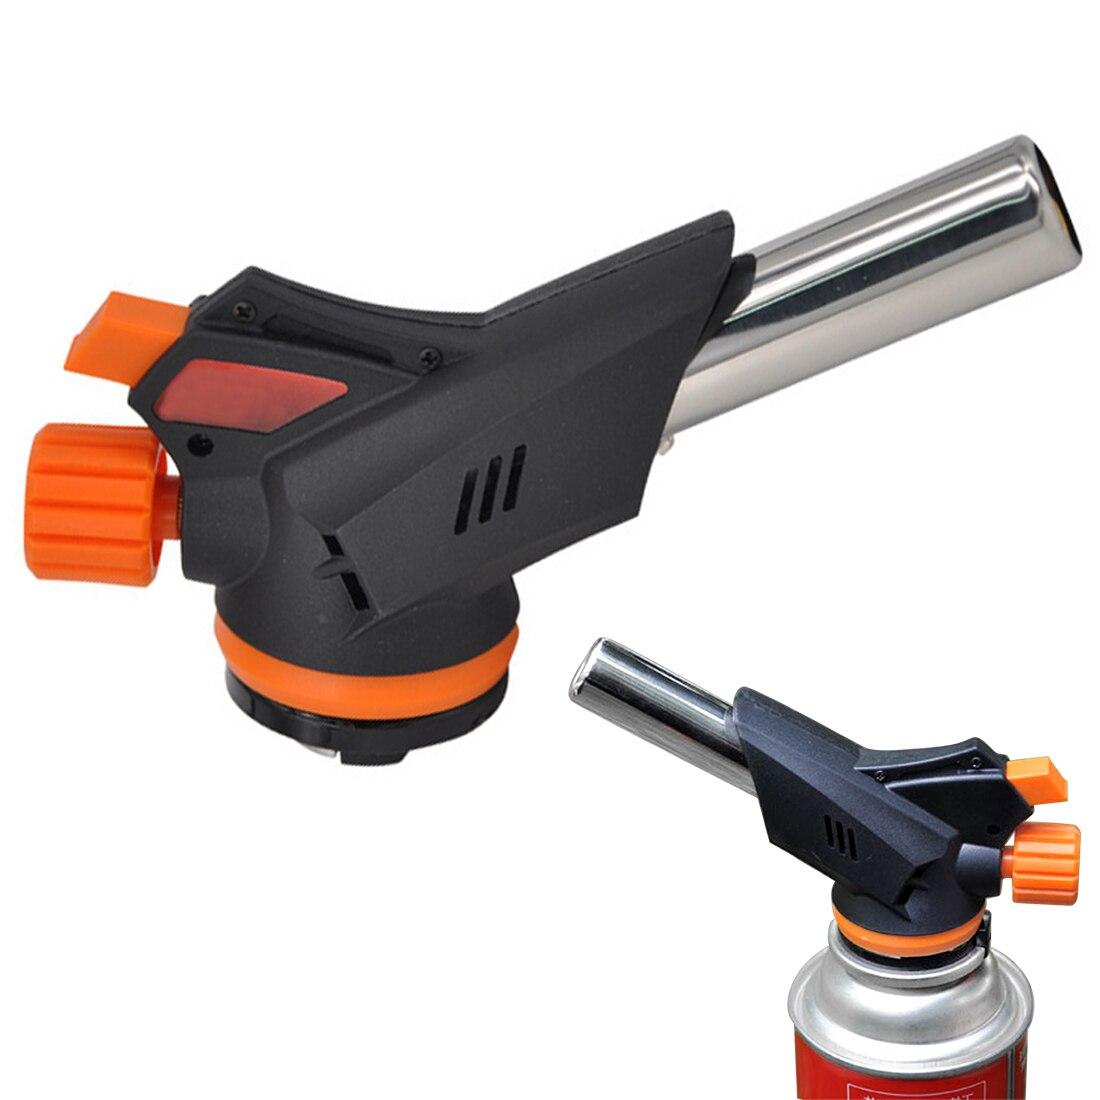 509C Gas Torch Flamethrower Automatic Multifunctional Piezo Lgnition Spray Gun Camping Welding BBQ Travel Flame Gun